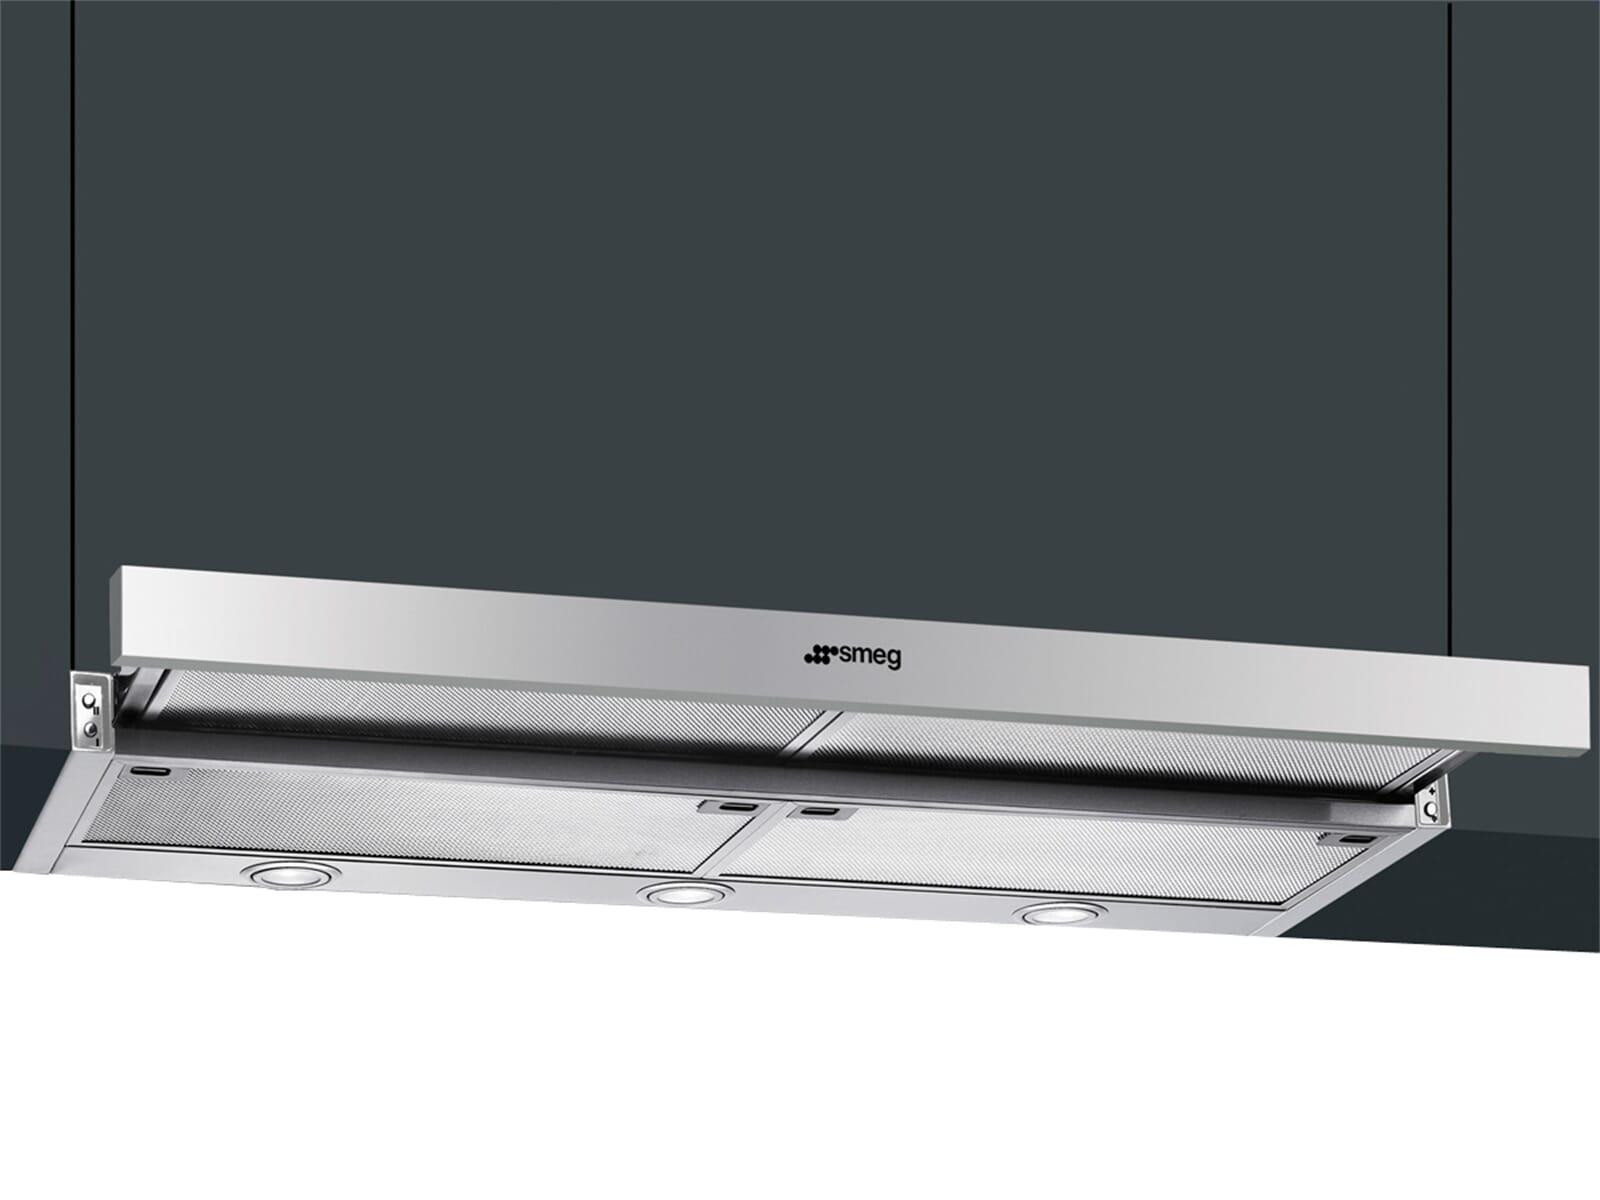 smeg kset910x flachschirm dunstabzugshaube edelstahl f r 449 00 eur. Black Bedroom Furniture Sets. Home Design Ideas